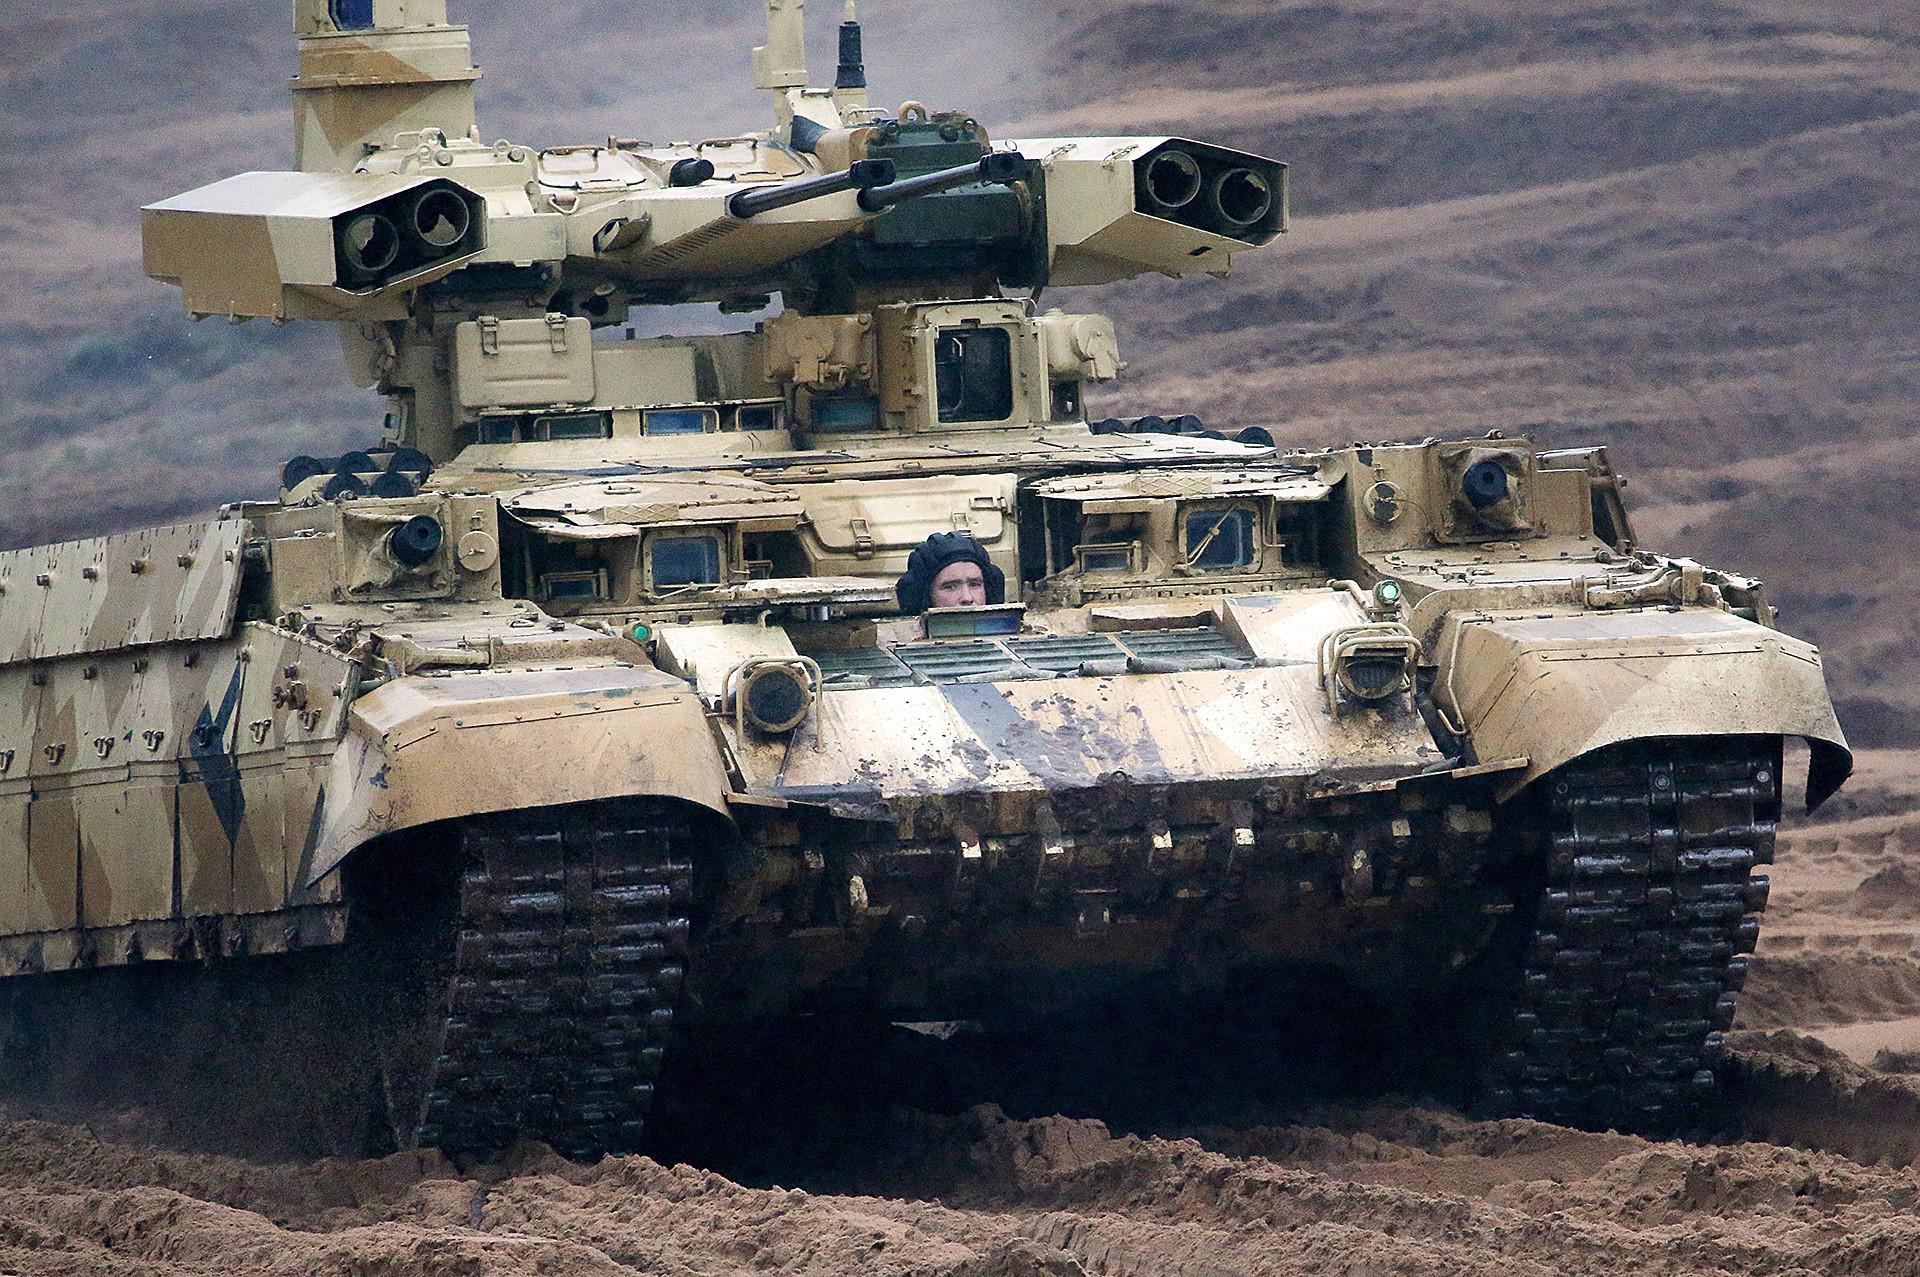 Kendaraan tempur BMPT-72 (Terminator-2) saat latihan militer Rusia-Belarus.